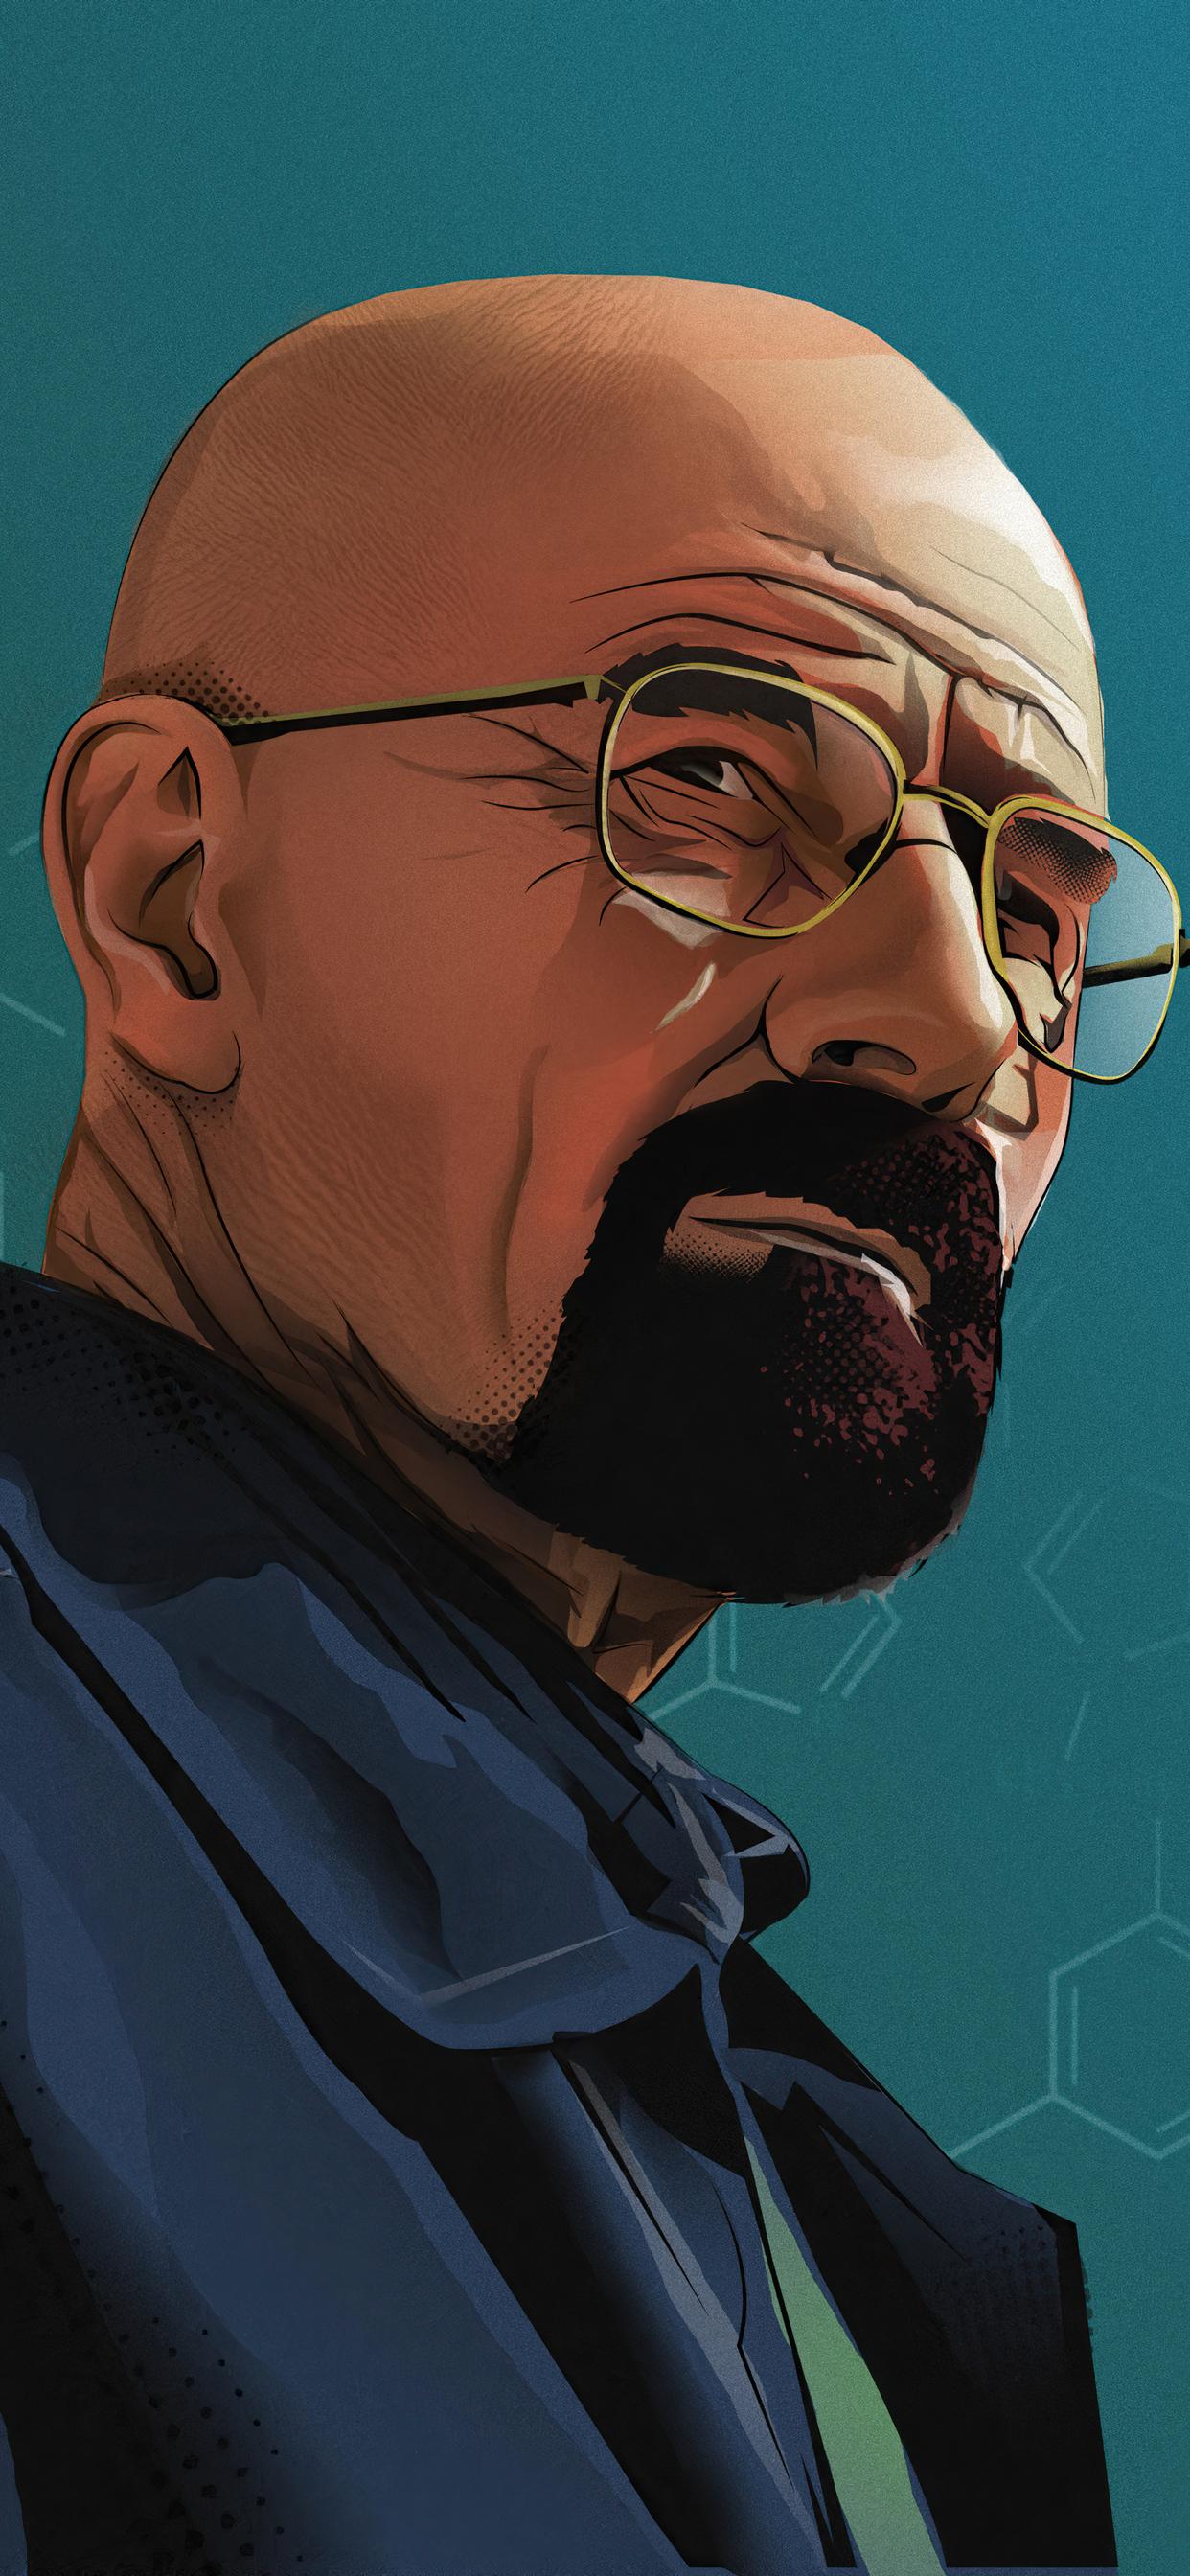 1242x2688 Walter White In Breaking Bad 4k Artwork Iphone ...